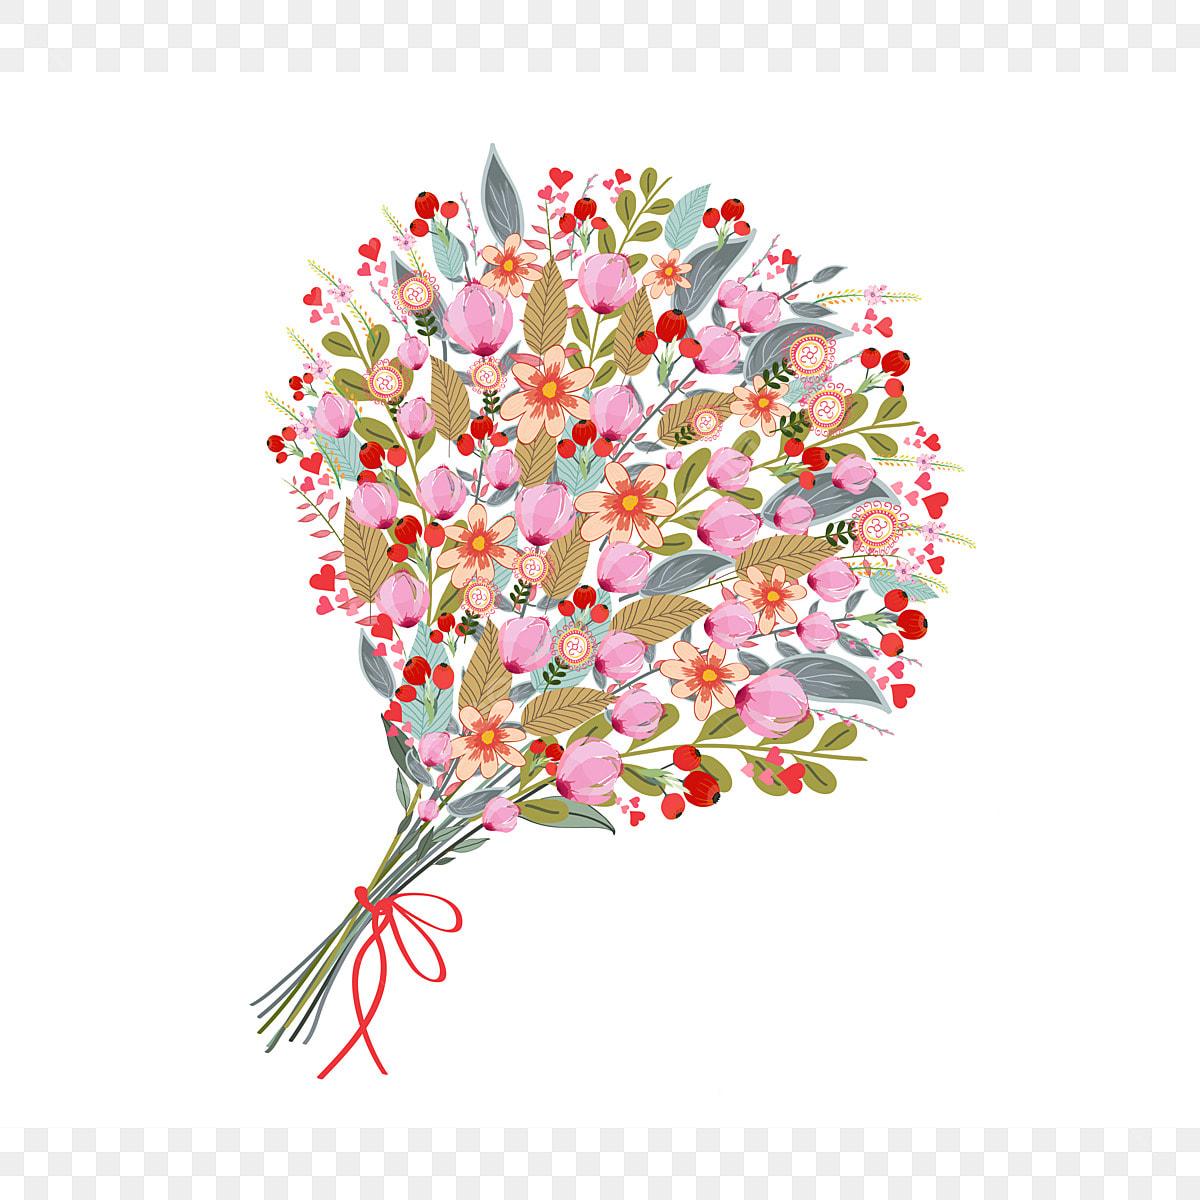 Watercolor Flowers Bouquet On White Background Flower Bird